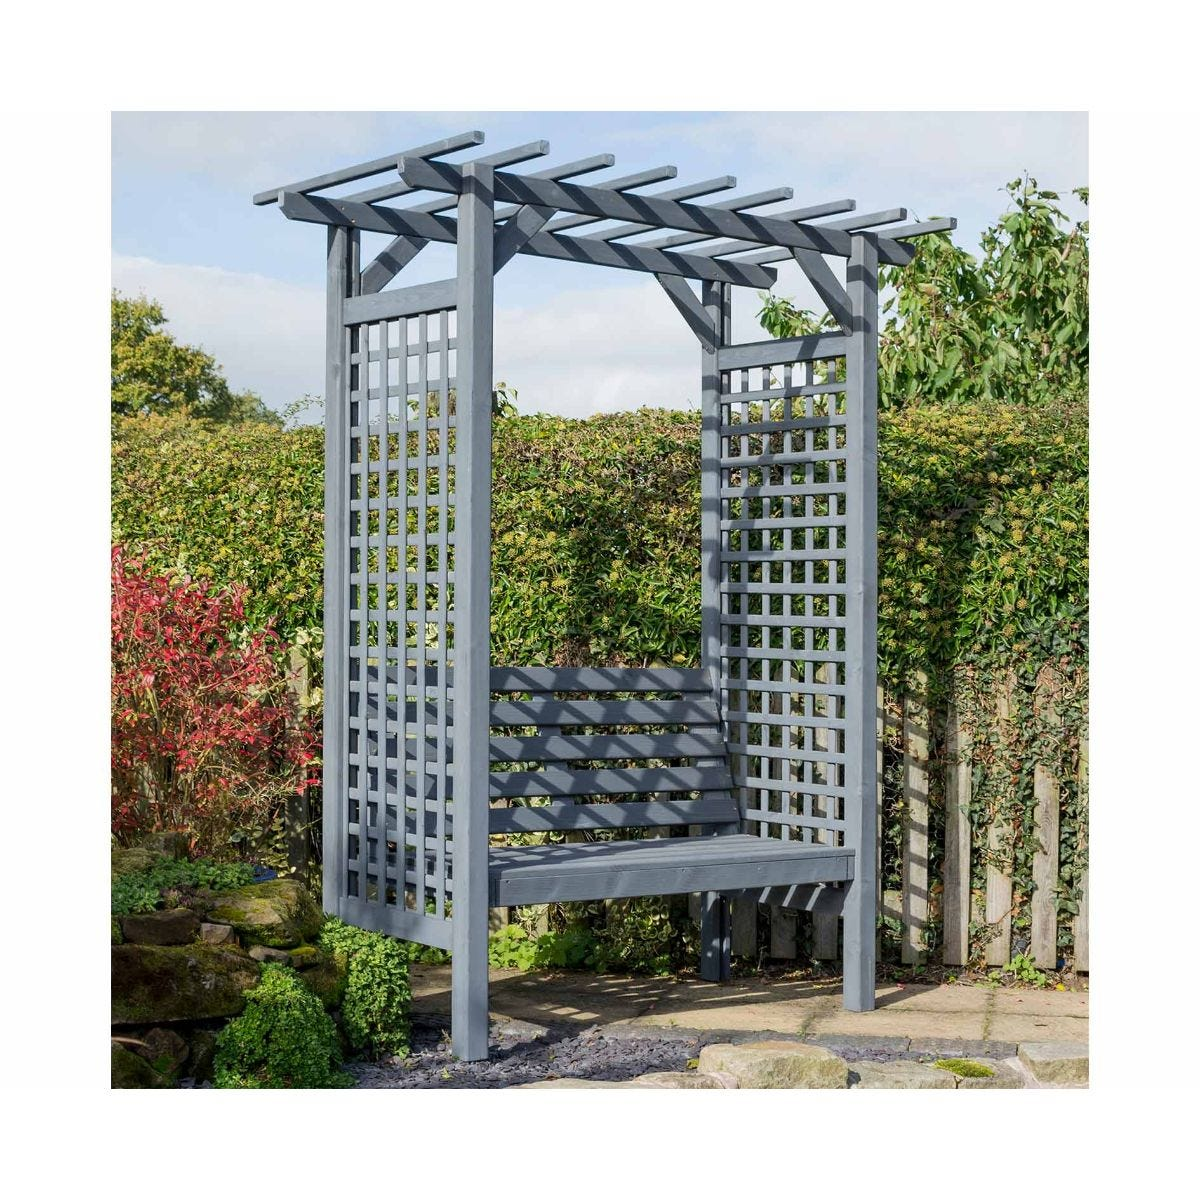 Rowlinson Sorrento Square Arbour Garden Furniture, Grey